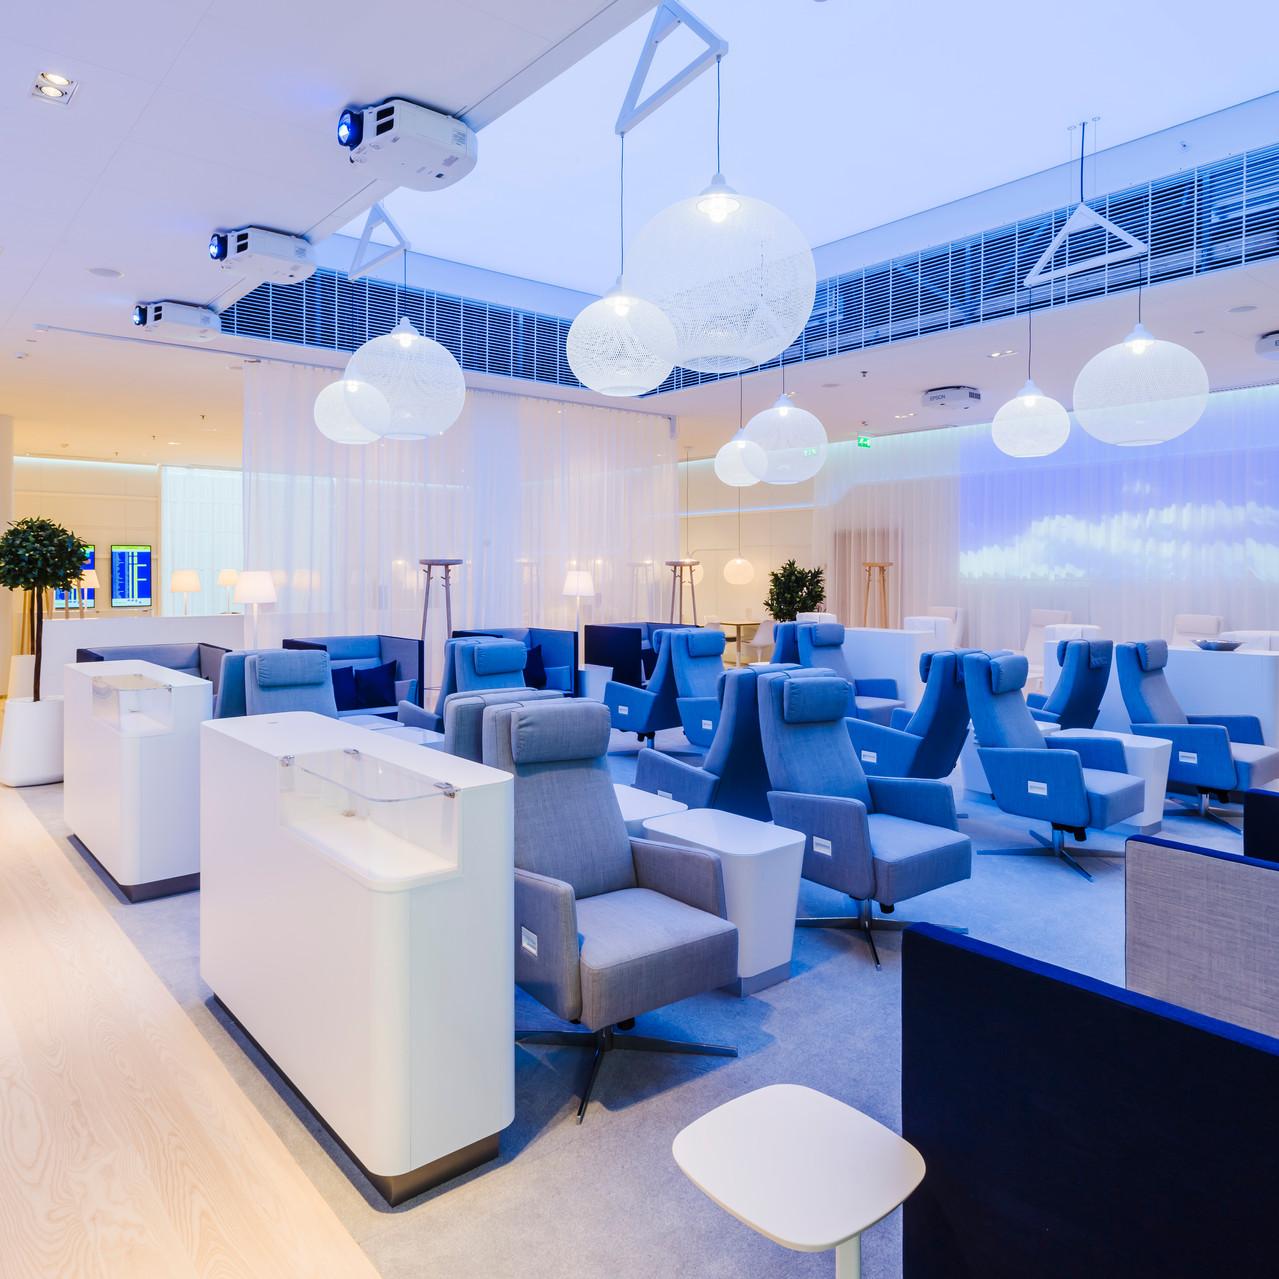 000_Helsinkir Premium Lounge_Finnair